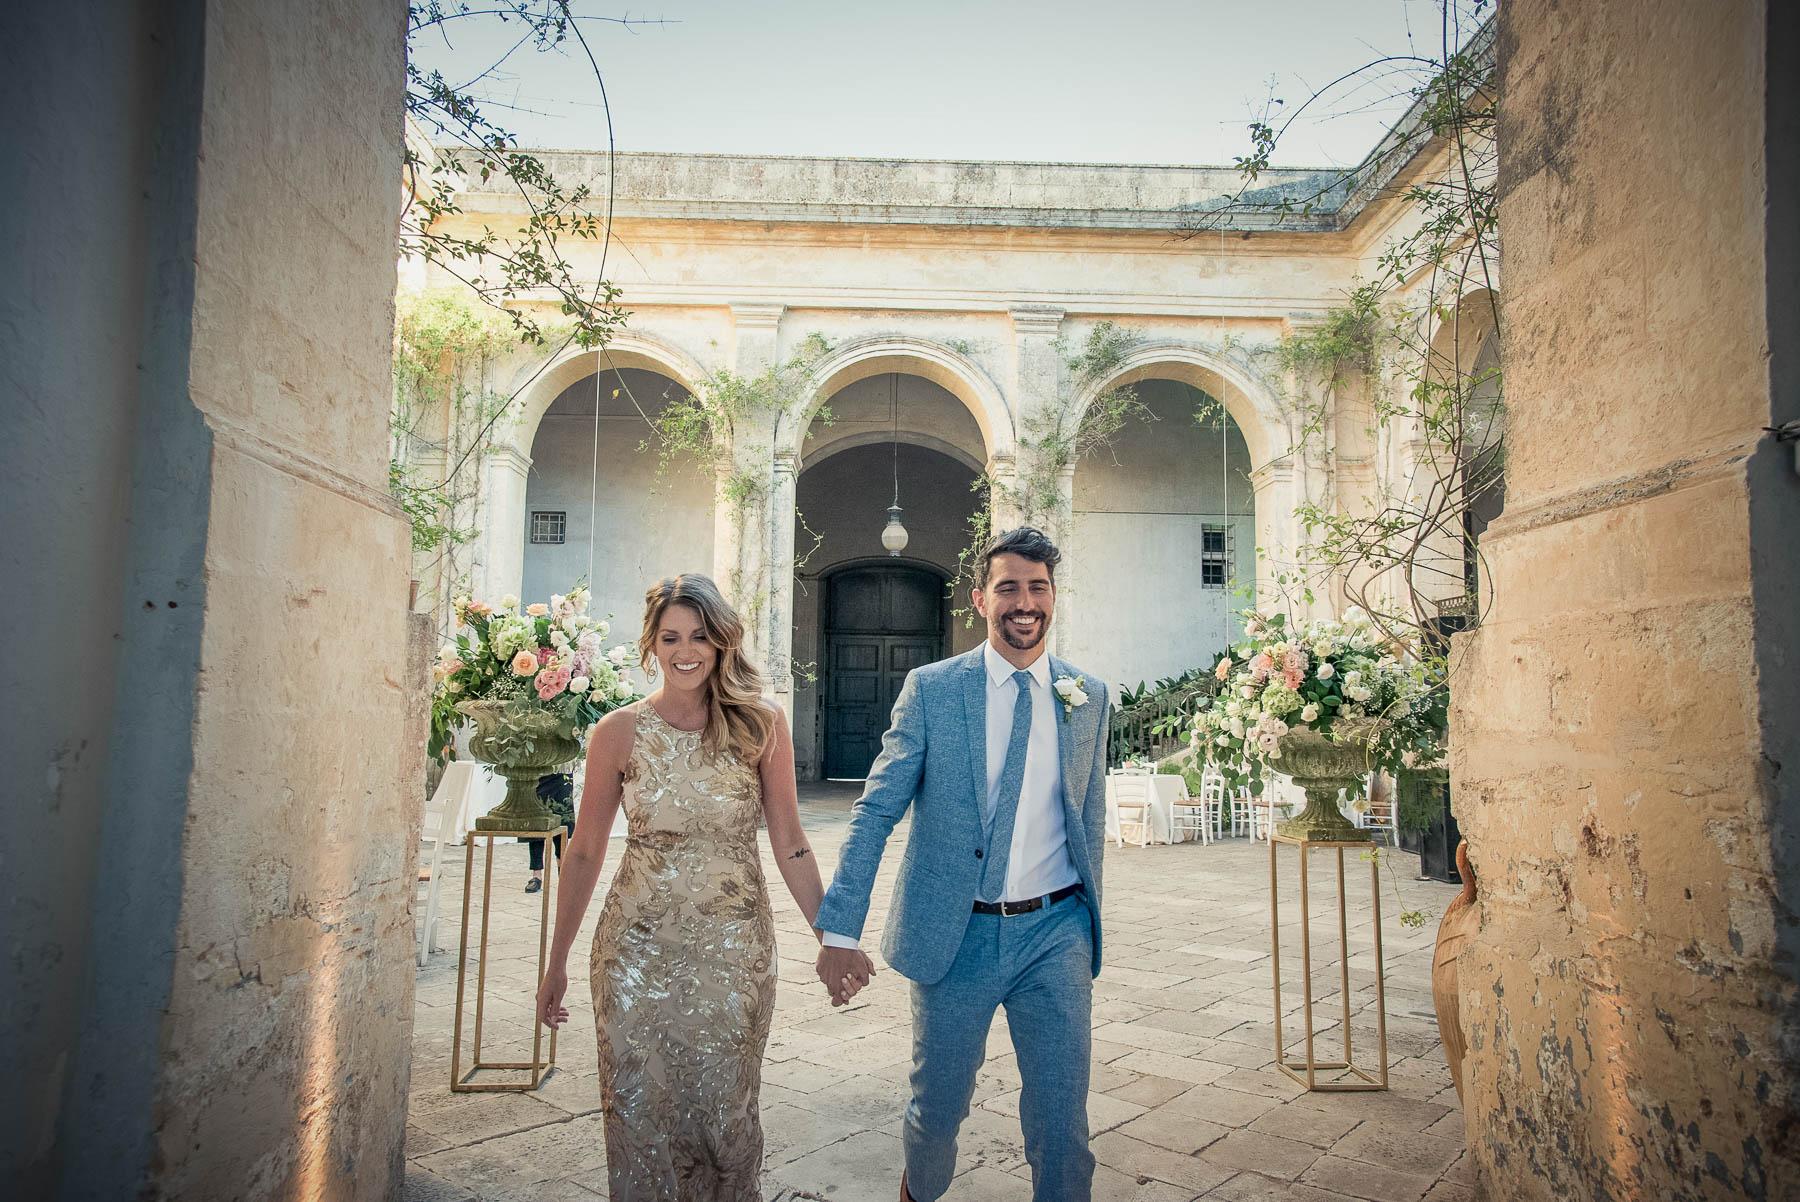 wedding palazzo daniele apulia 11.jpg